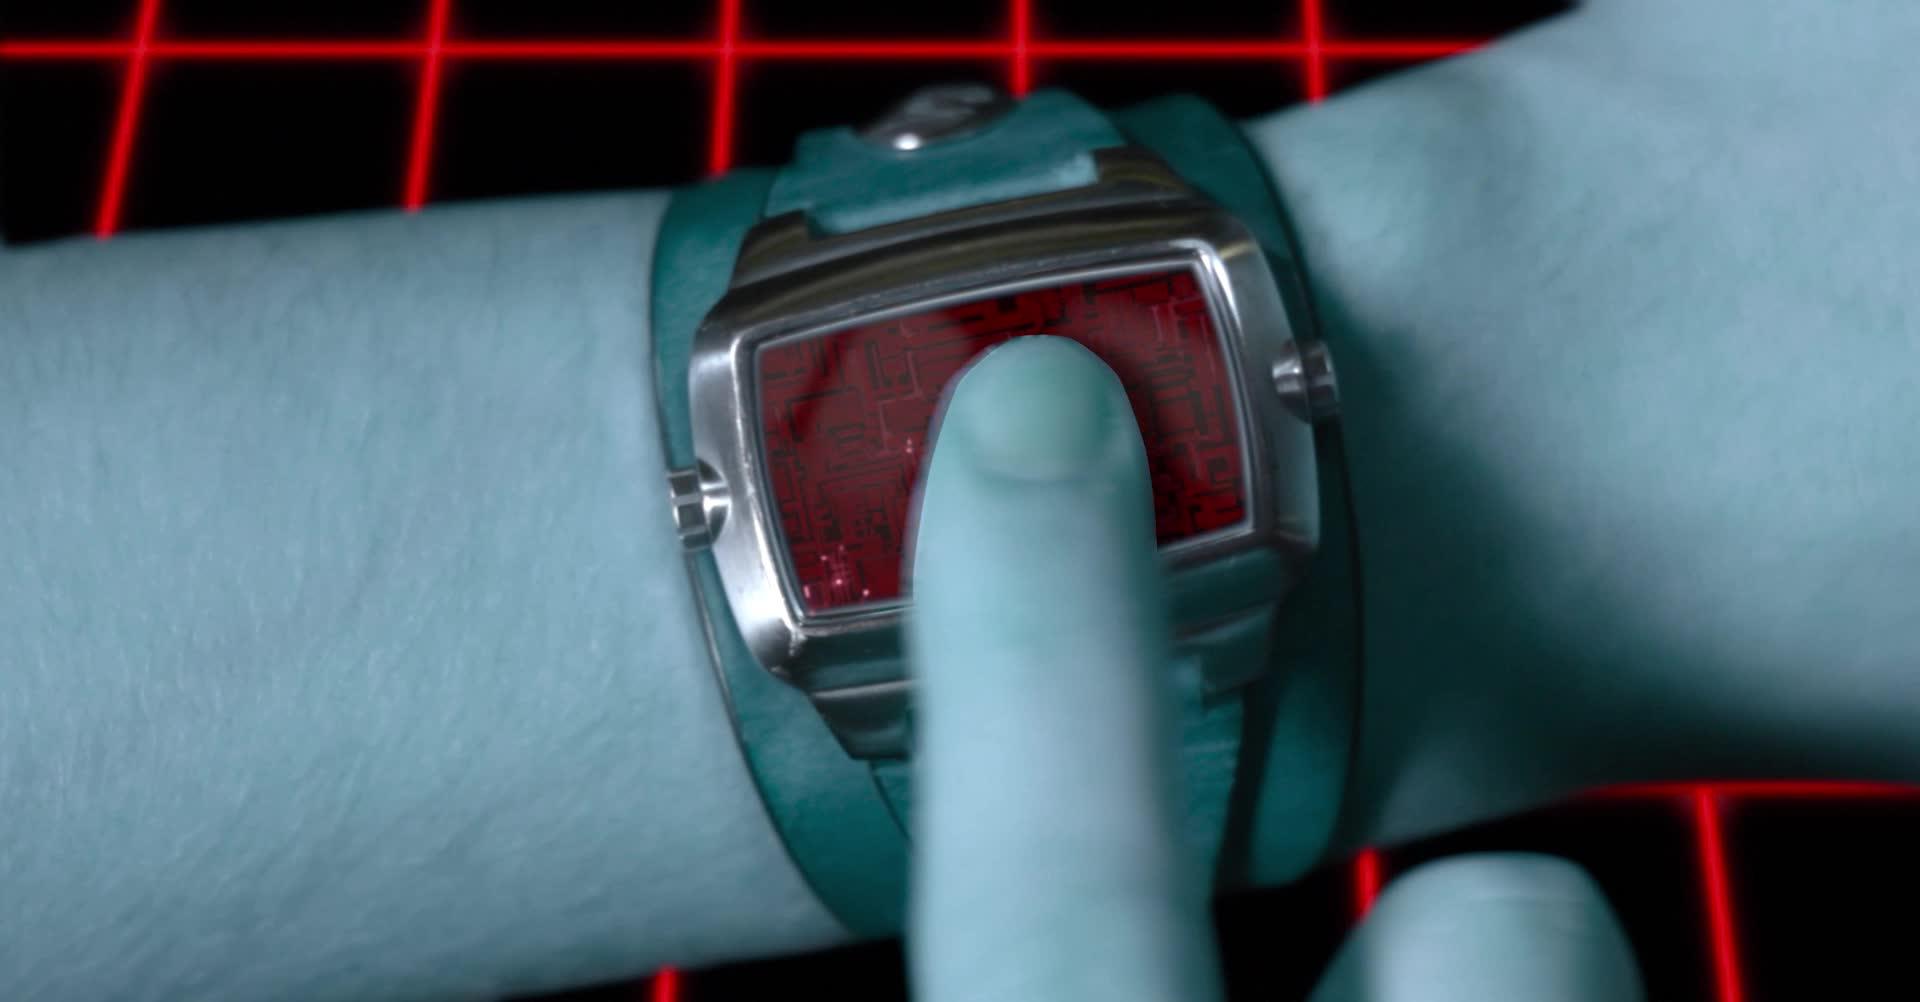 Nuke, Tron, Watches GIFs